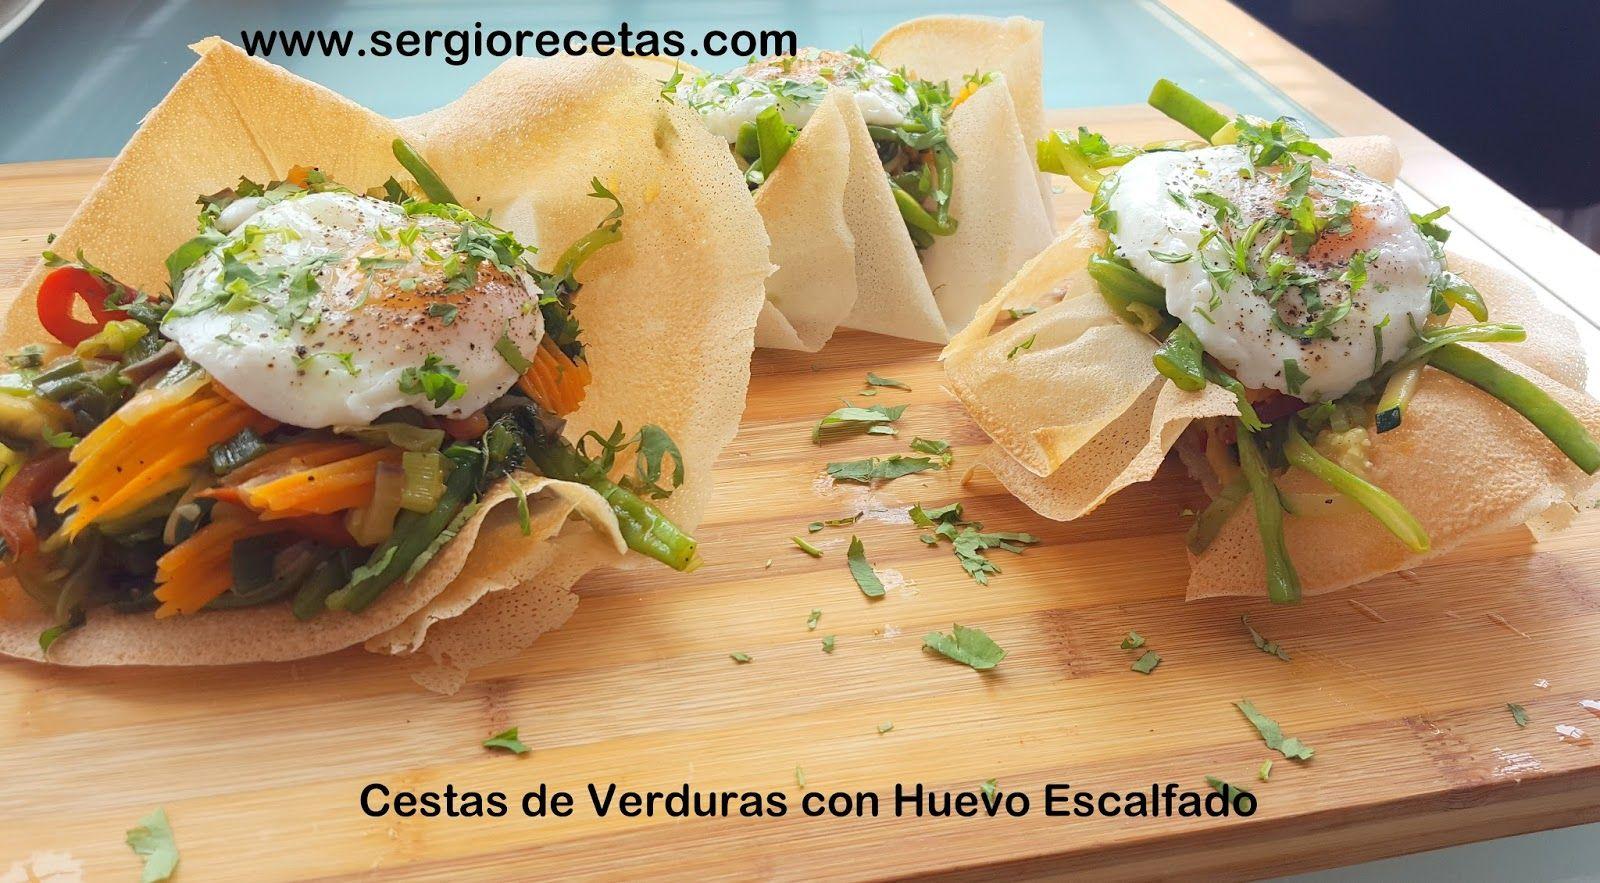 Sergio Benito Recetas: Cestas de Verduras Salteadas con Huevo Escalfado/Un Entrante Perfecto para una Dieta Equilibrada.